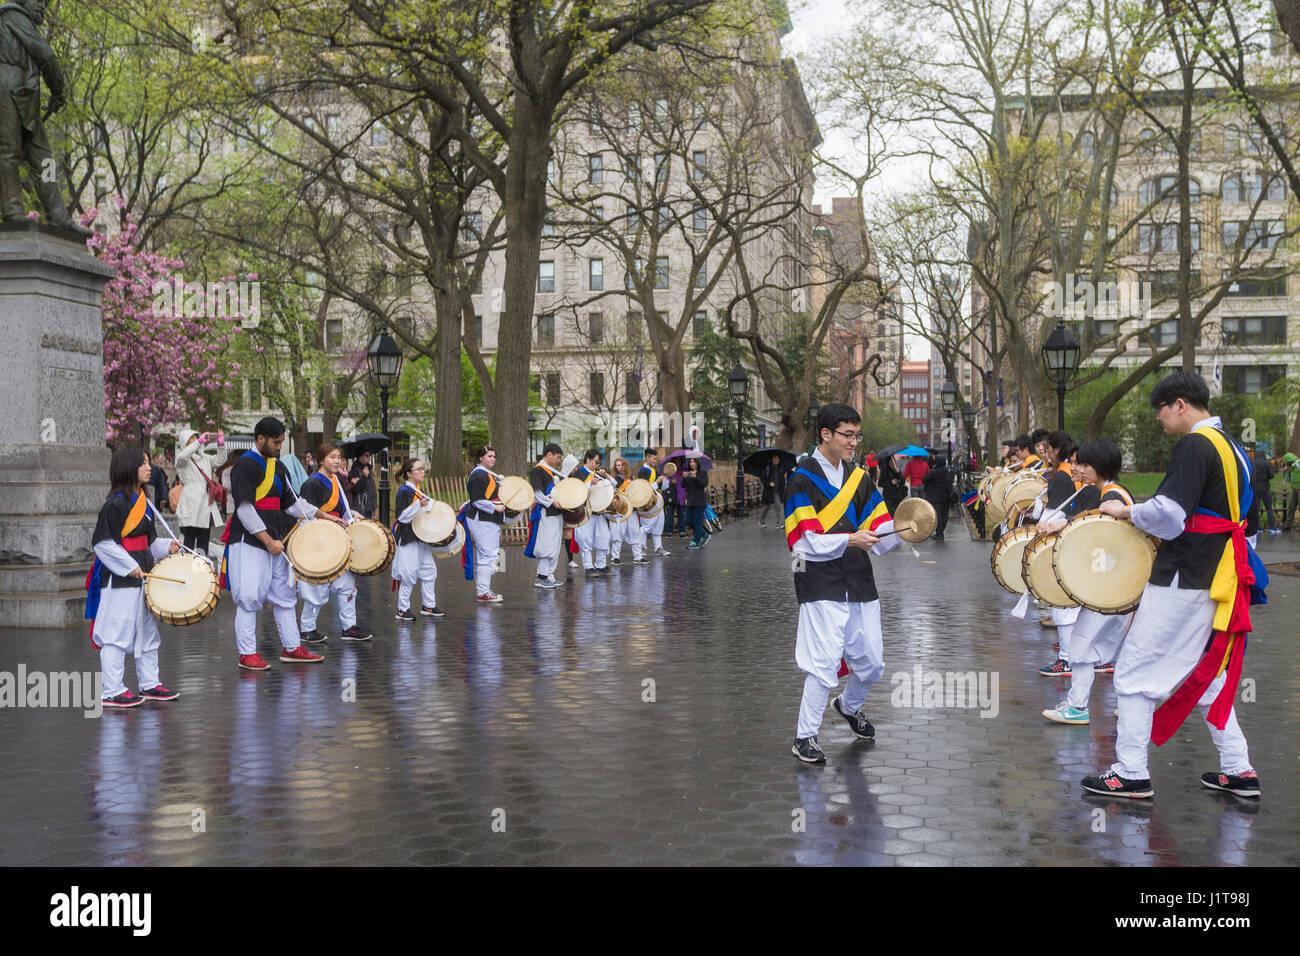 New York, NY 22 April 2017 - NYU Rhythmic Impulse, a group of Korean NYU Students who play traditional Korean drums, - Stock Image